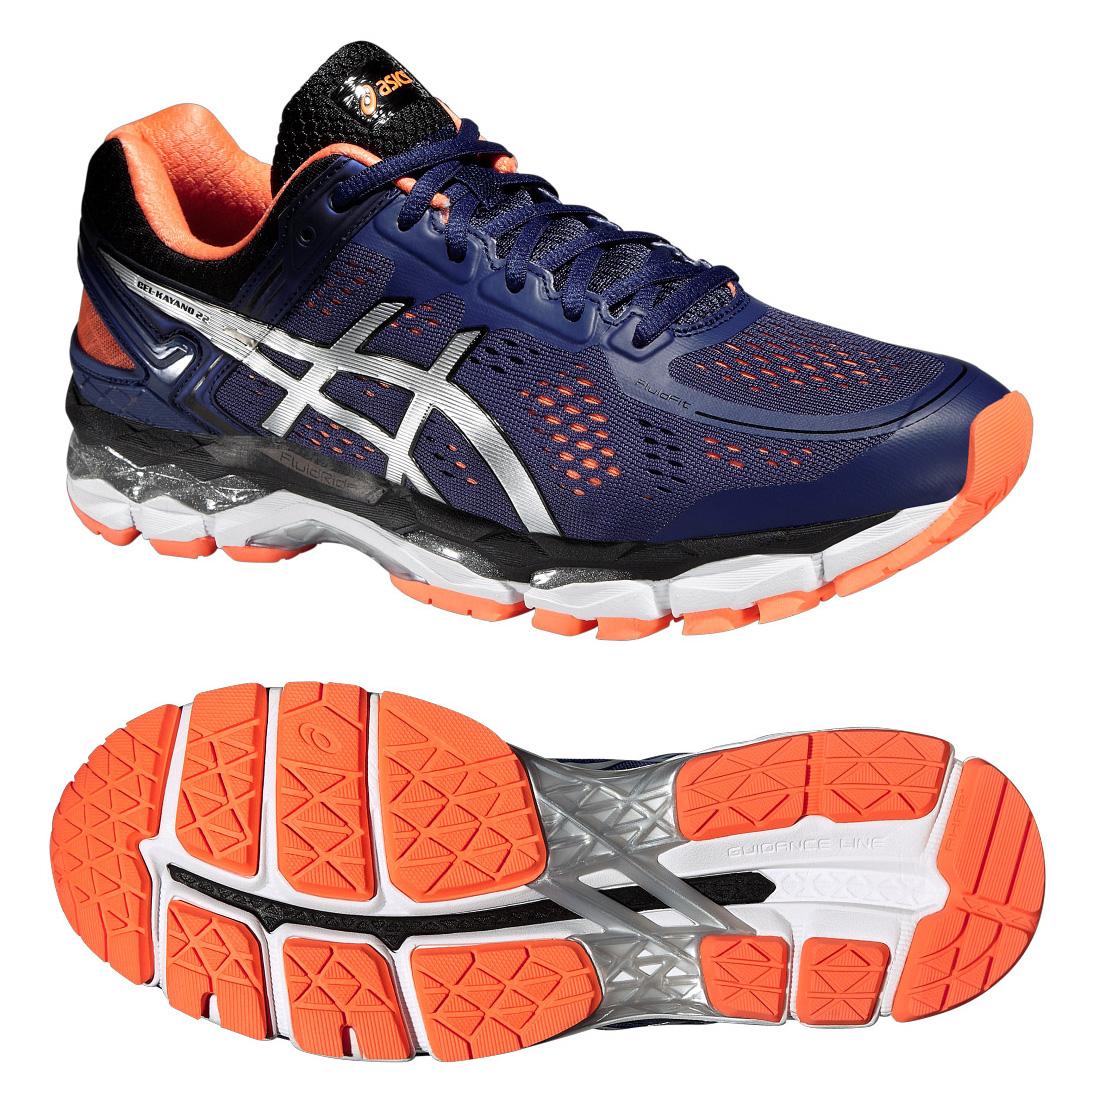 asics gel kayano 21 running shoes aw15. Black Bedroom Furniture Sets. Home Design Ideas